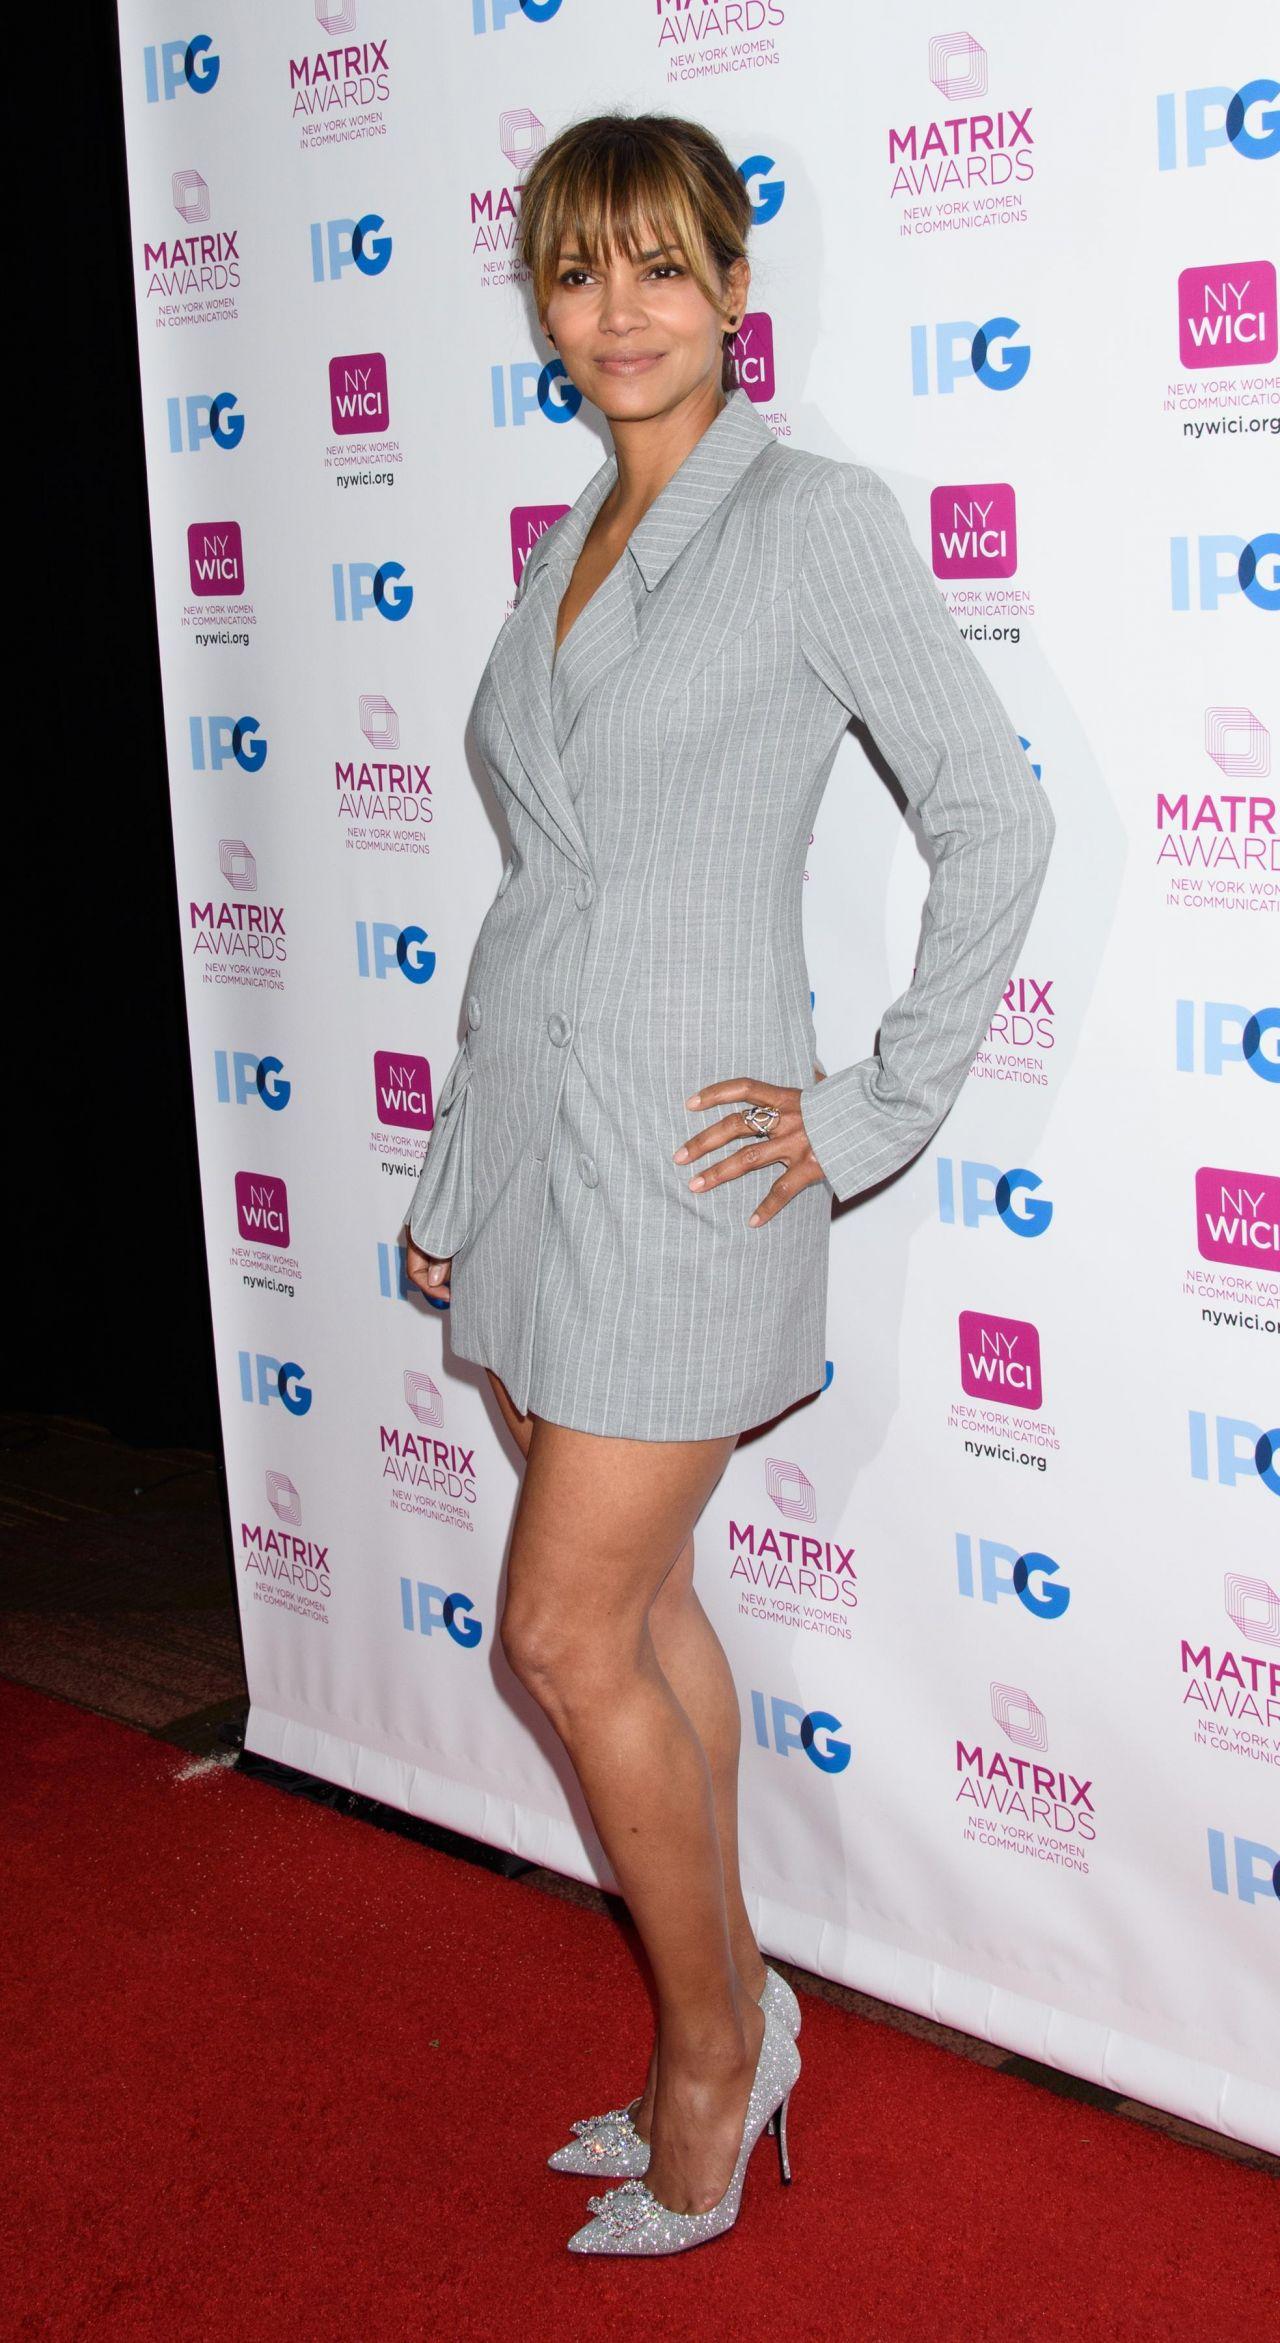 https://celebmafia.com/wp-content/uploads/2018/04/halle-berry-new-york-women-in-communication-matrix-awards-2018-7.jpg